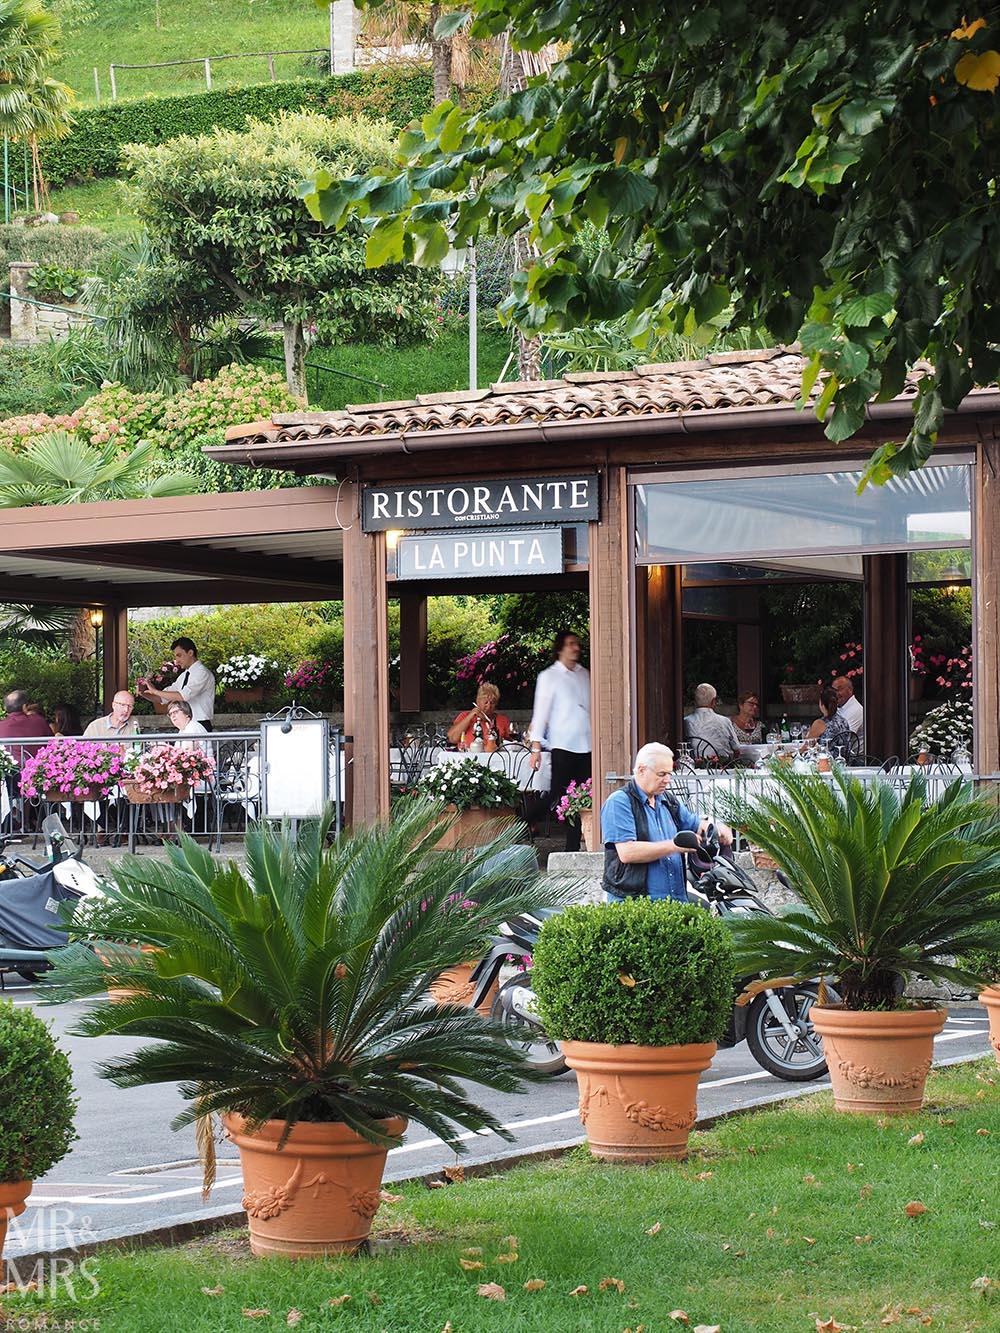 Ultimate Guide to Lake Como, Italy - Ristorante La Punta at the northern tip of Bellagio